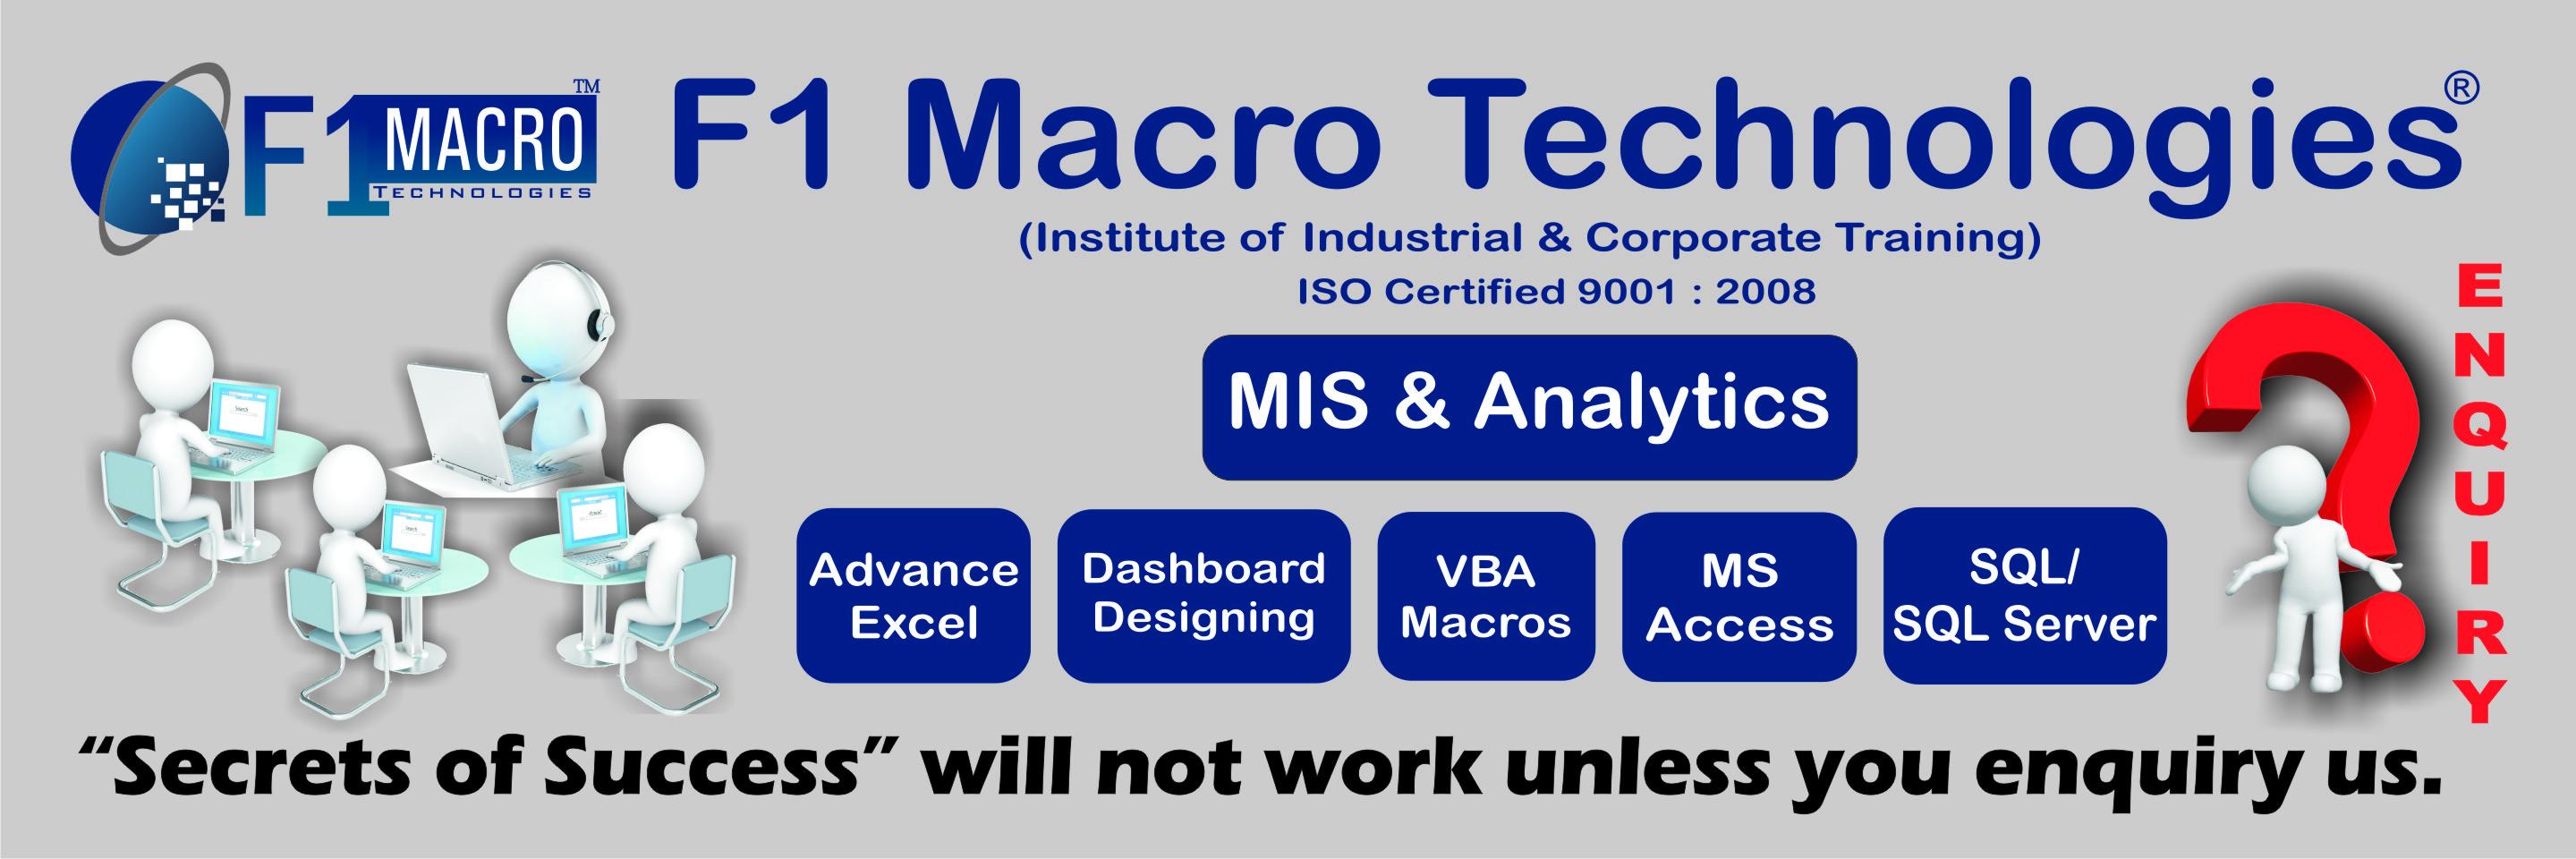 VBA Macros Training in Faridabad, Certification | Sulekha